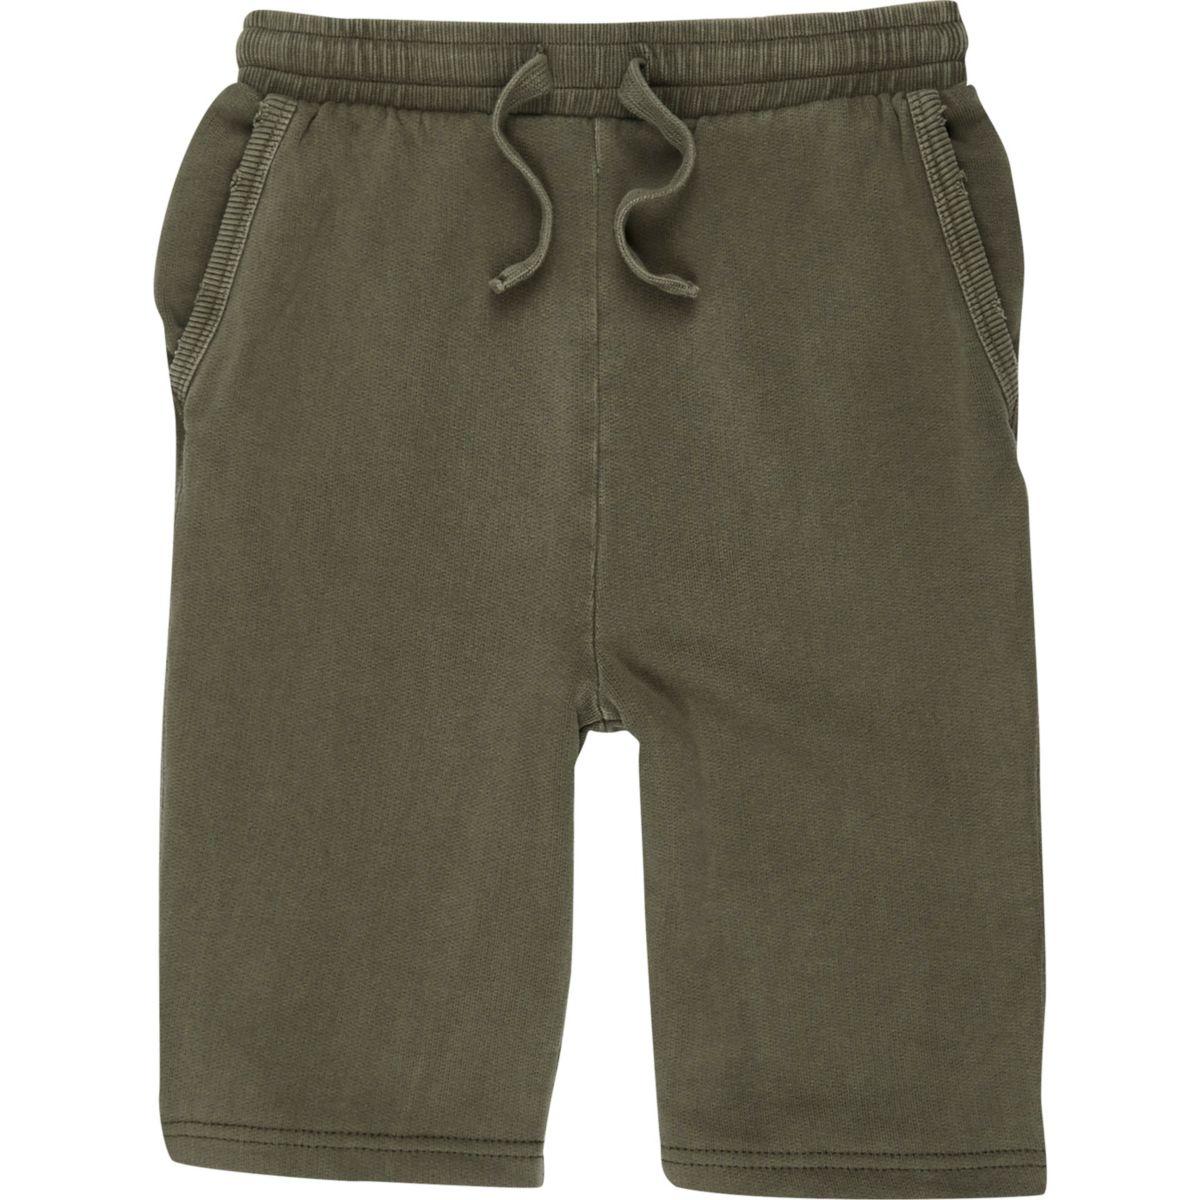 Short en jersey kaki pour garçon